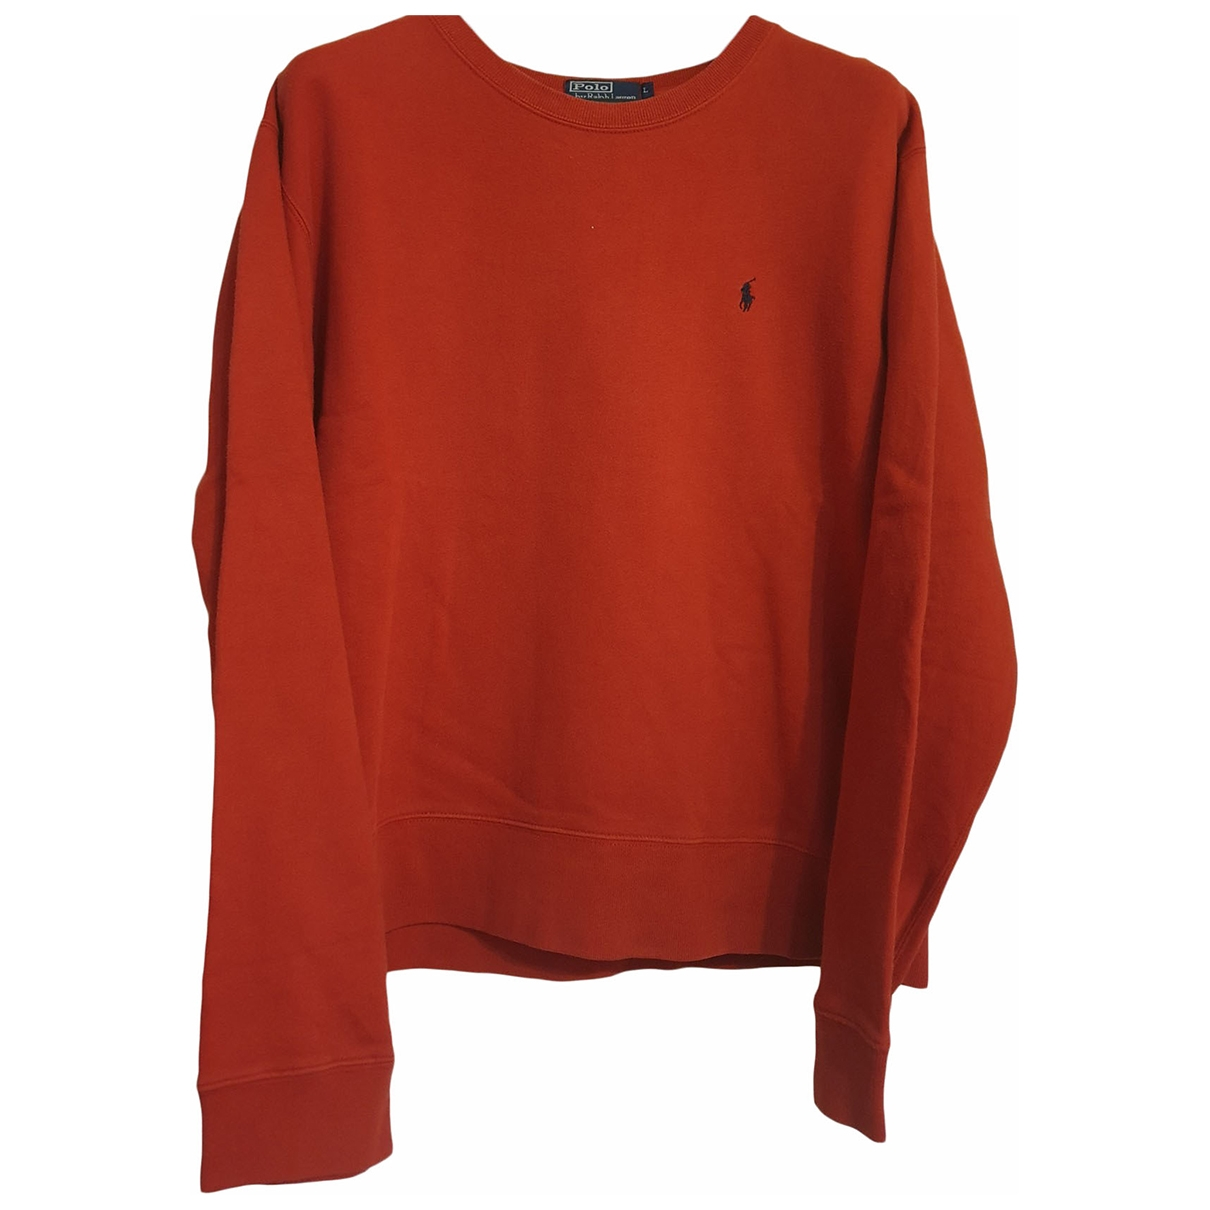 Polo Ralph Lauren \N Red Cotton Knitwear & Sweatshirts for Men XL International